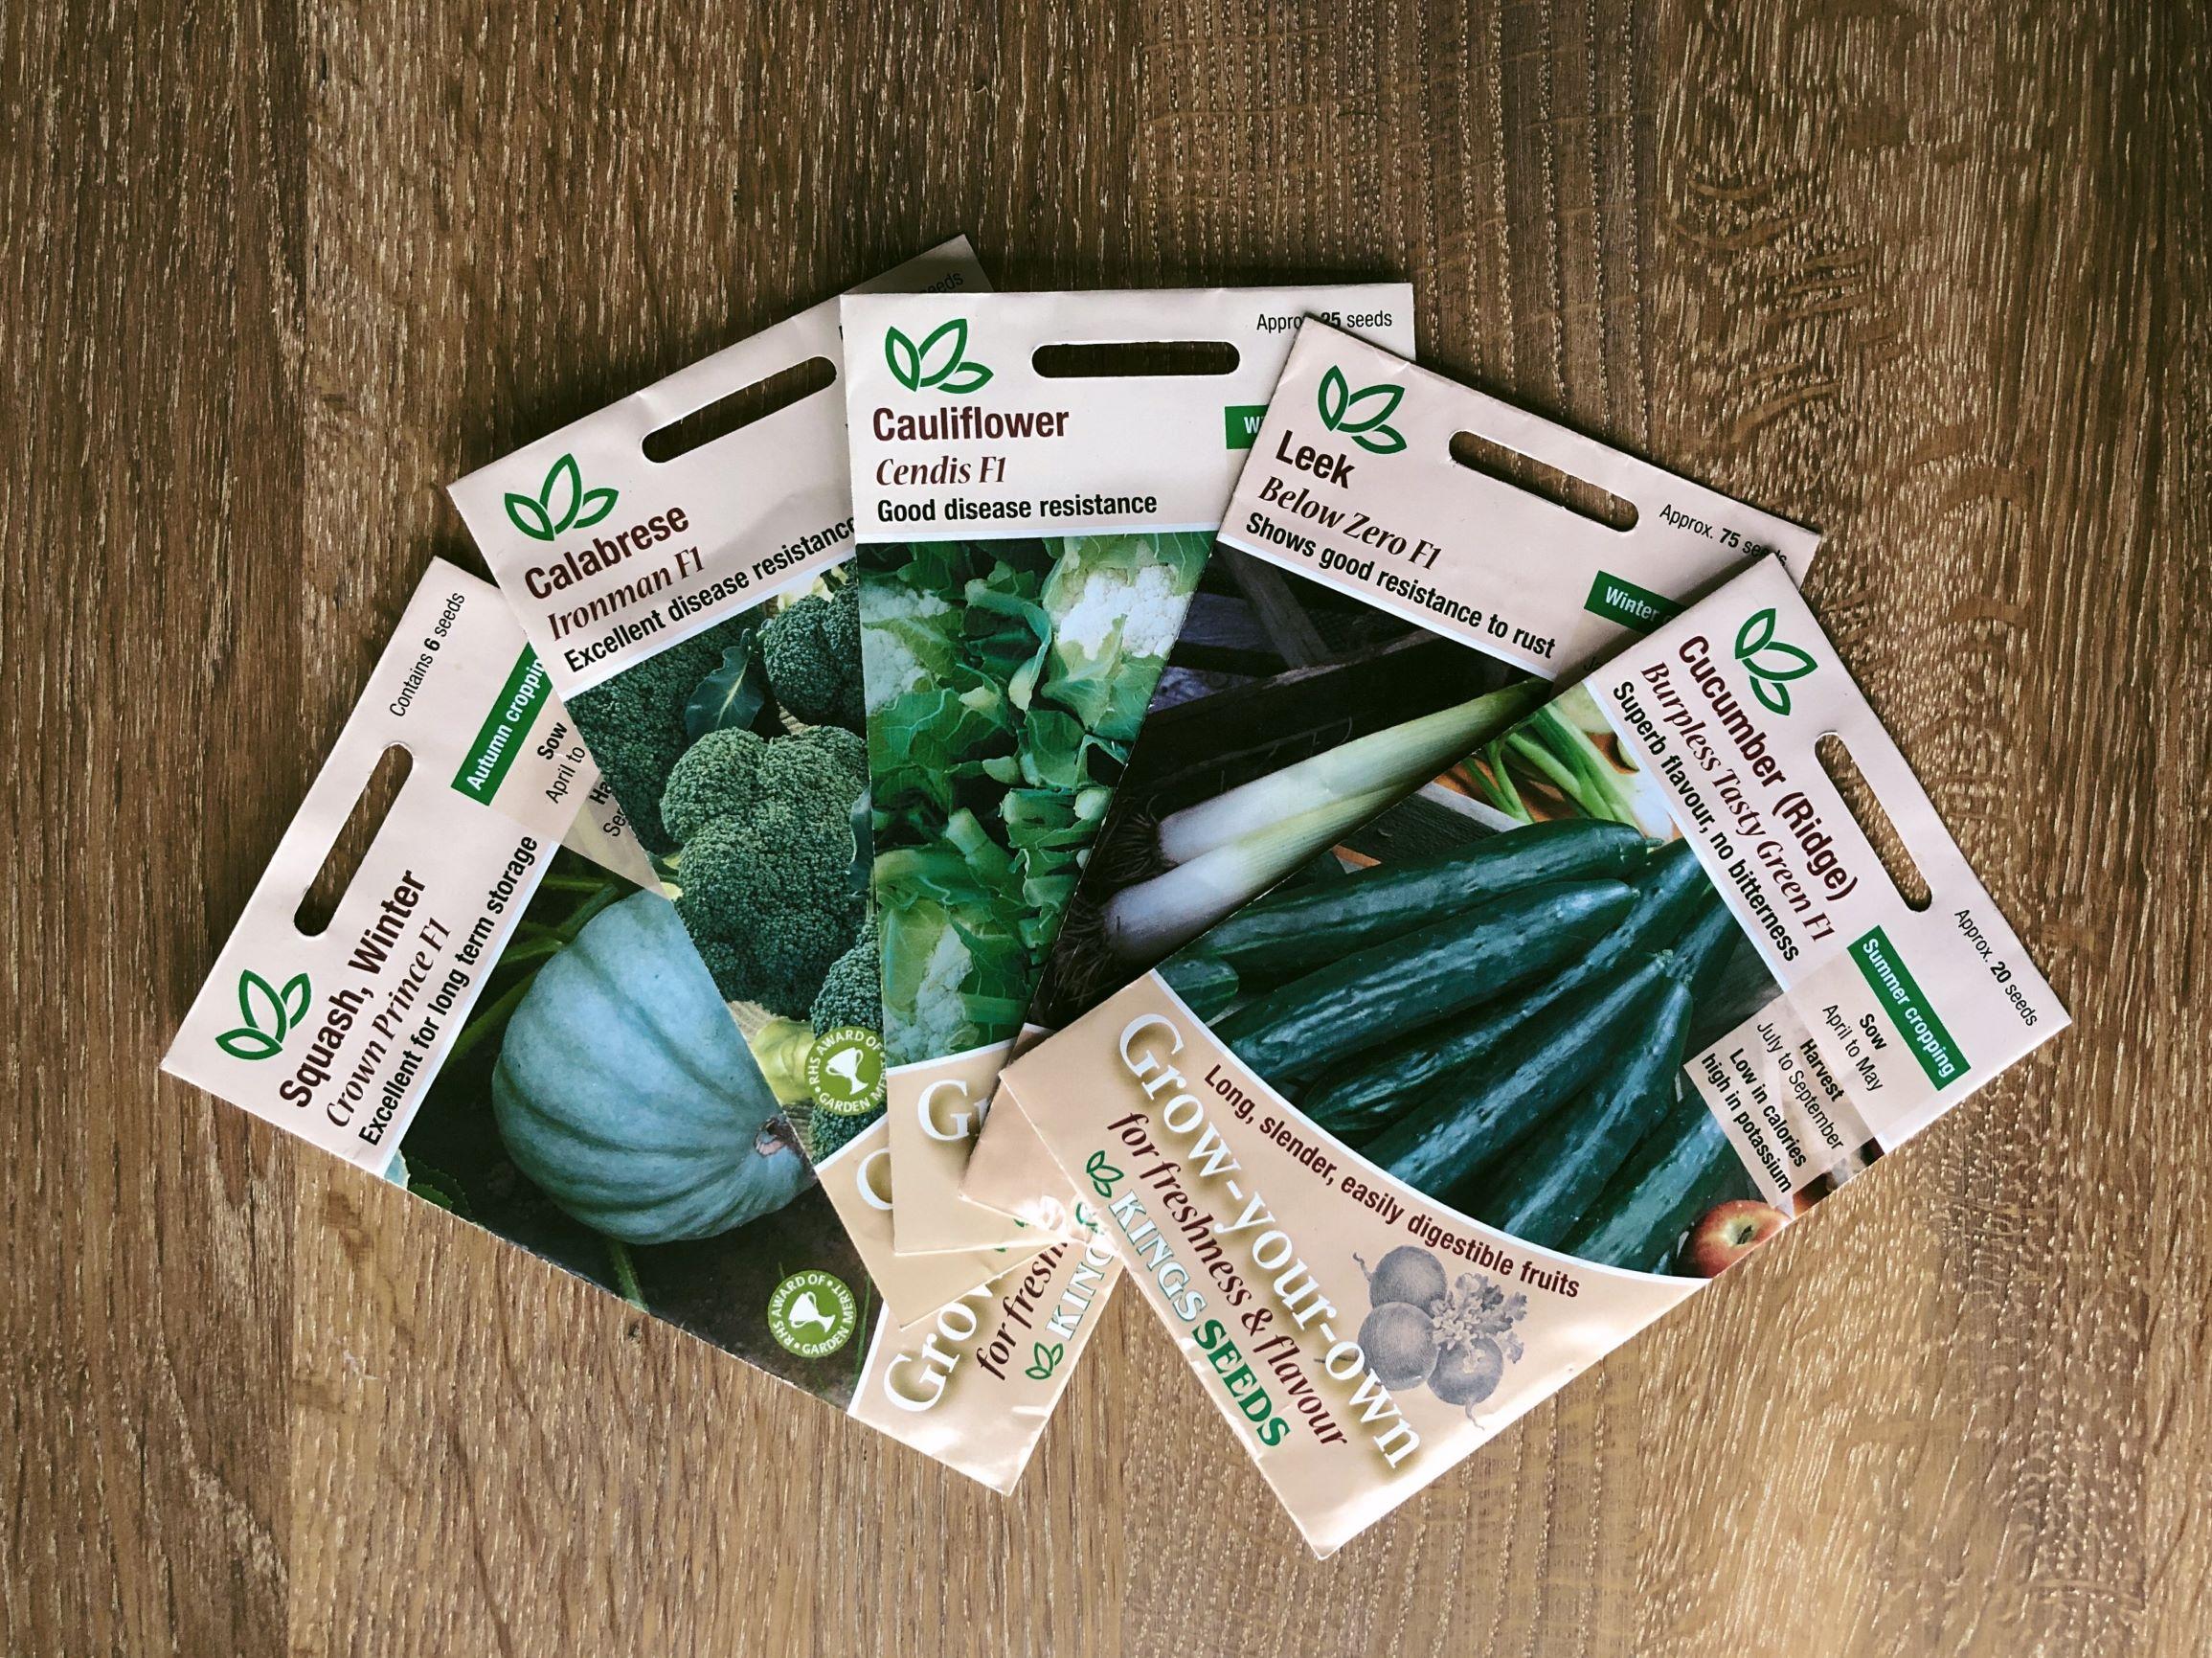 Different F1 Varieties Crown Prince, Calabrese, Cauliflower, Leek, Cucumber